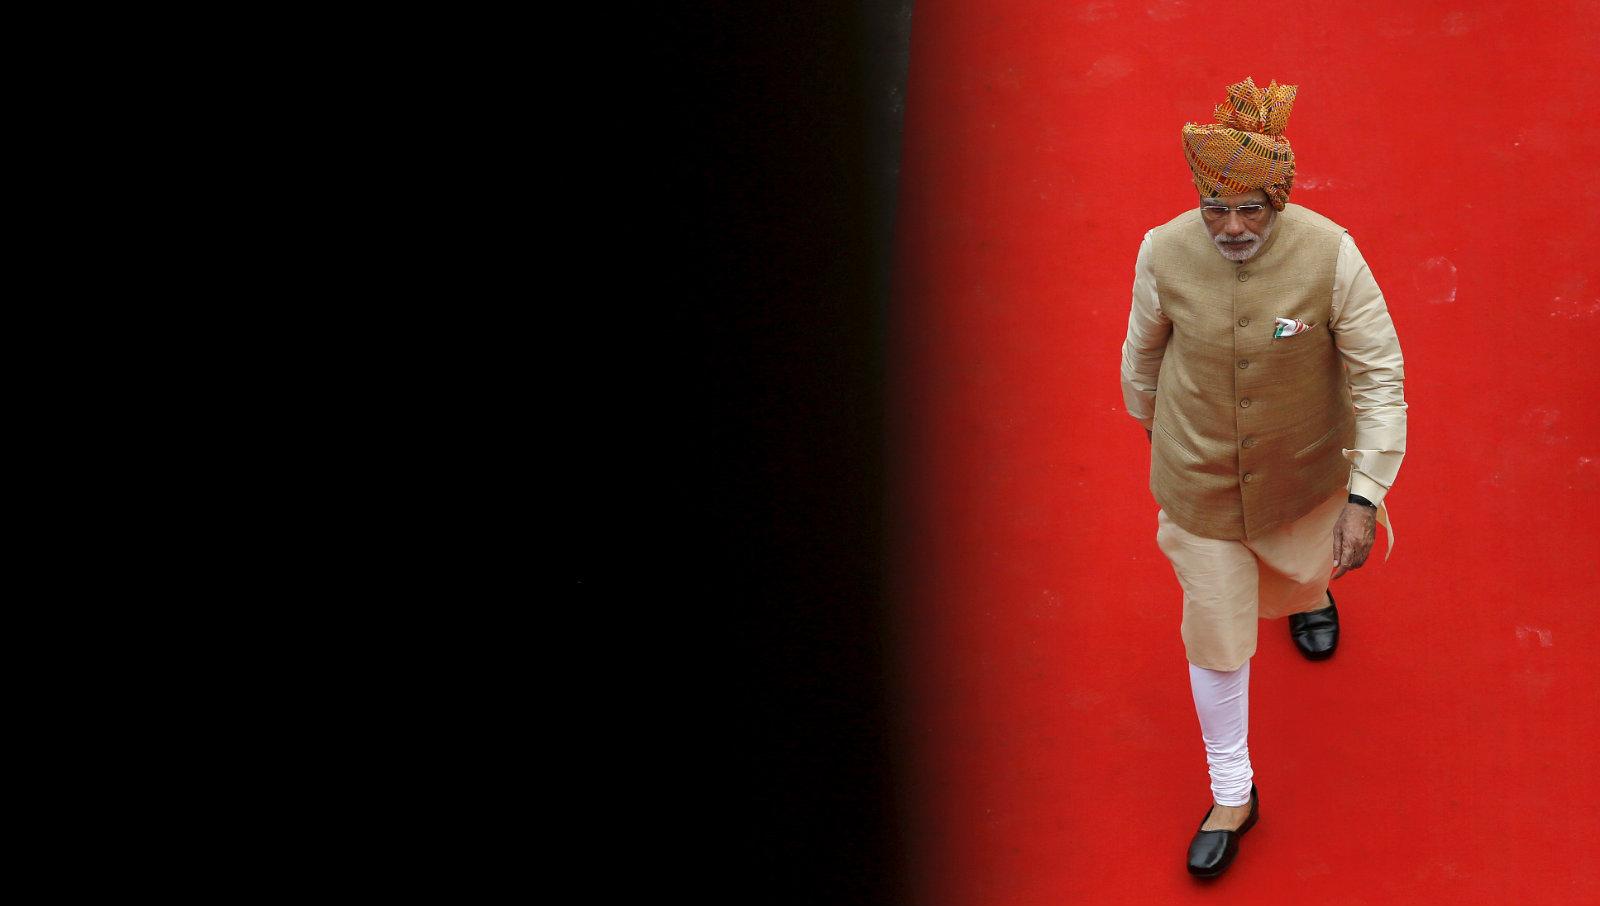 India-Modi-WEF-Asia